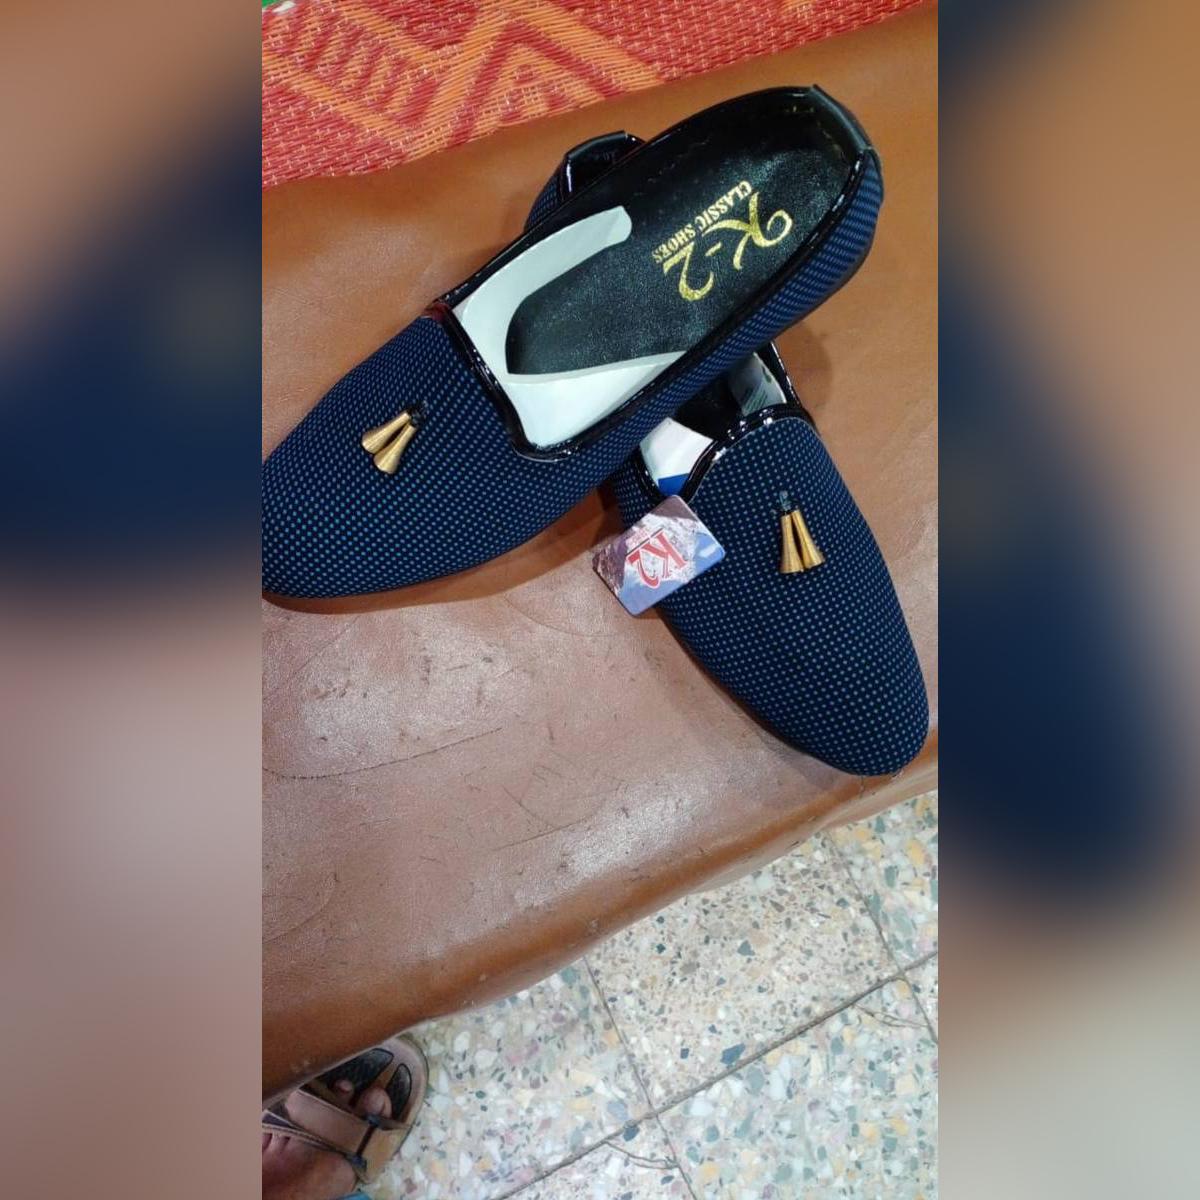 formal stylish & decent shoes for men's